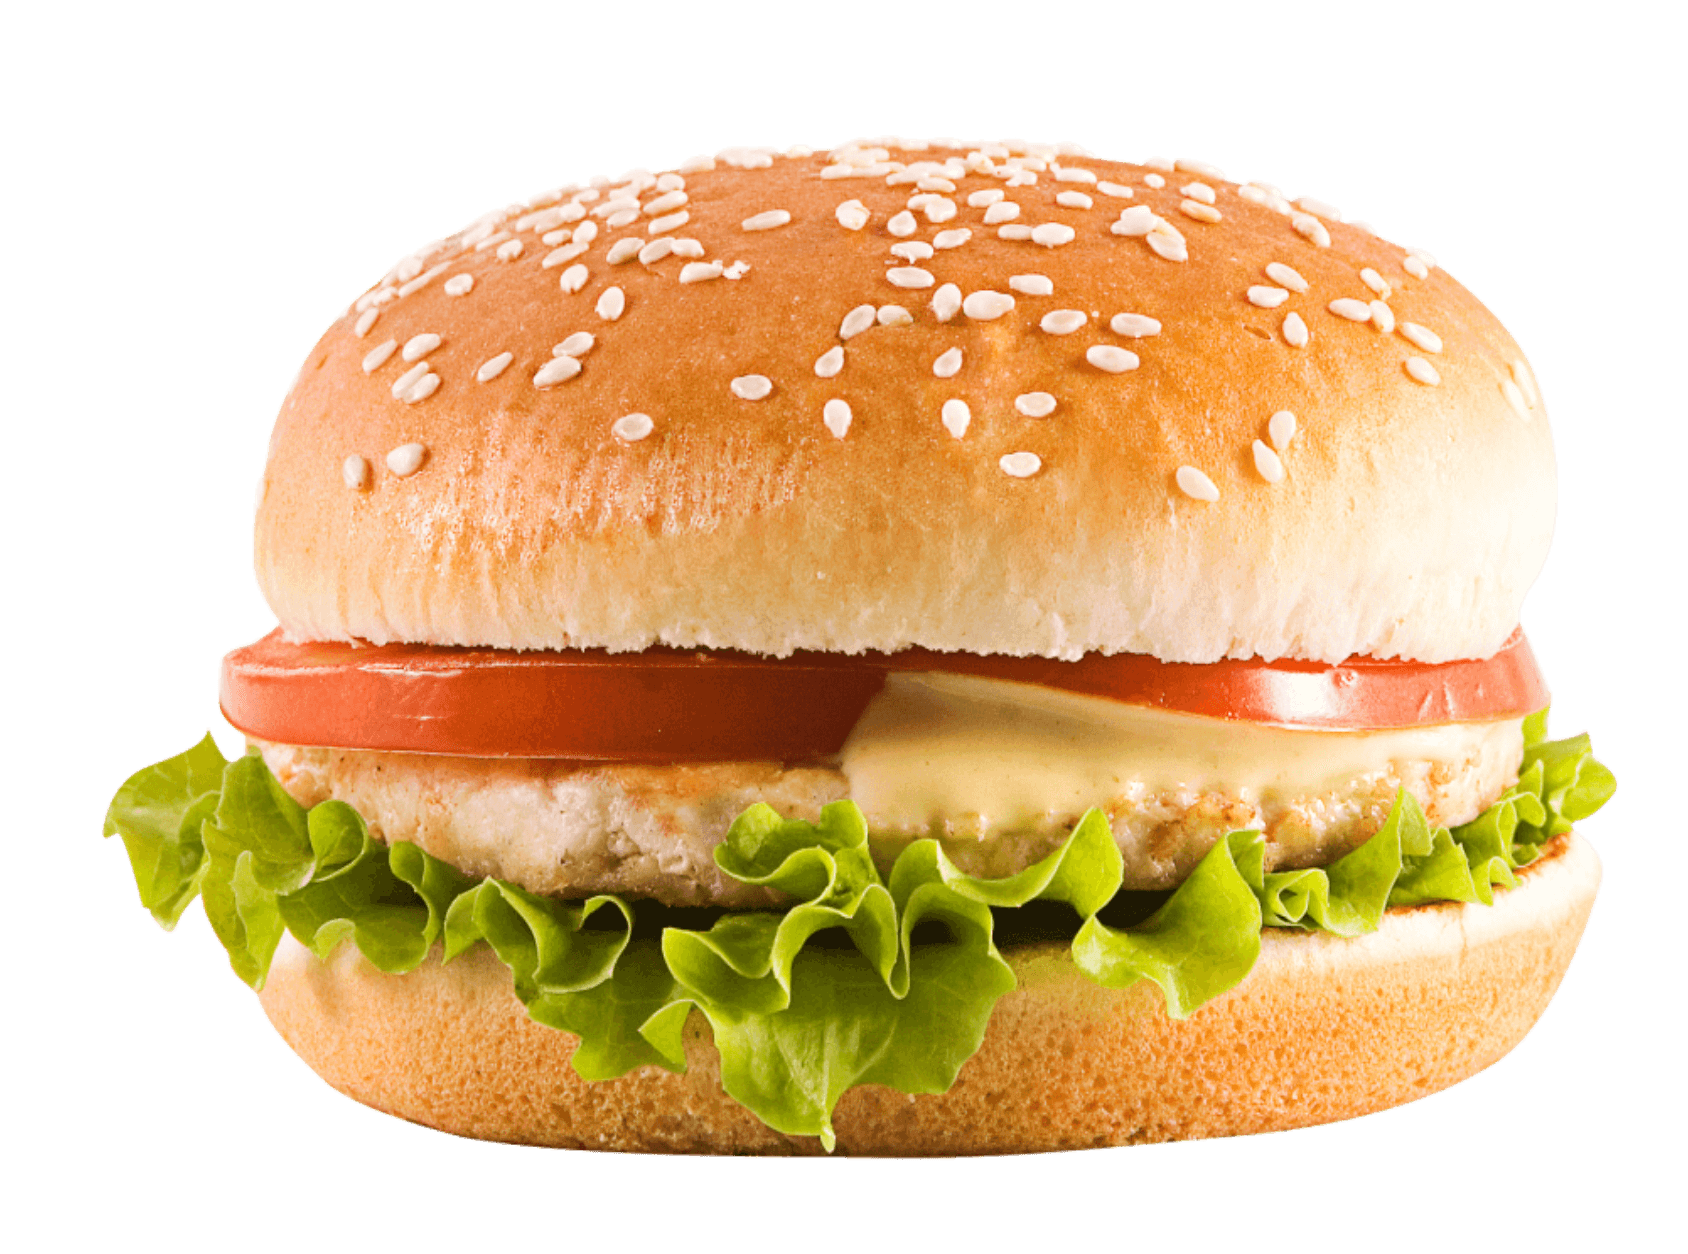 Hamburger clipart burge. Veggie burger transparent food